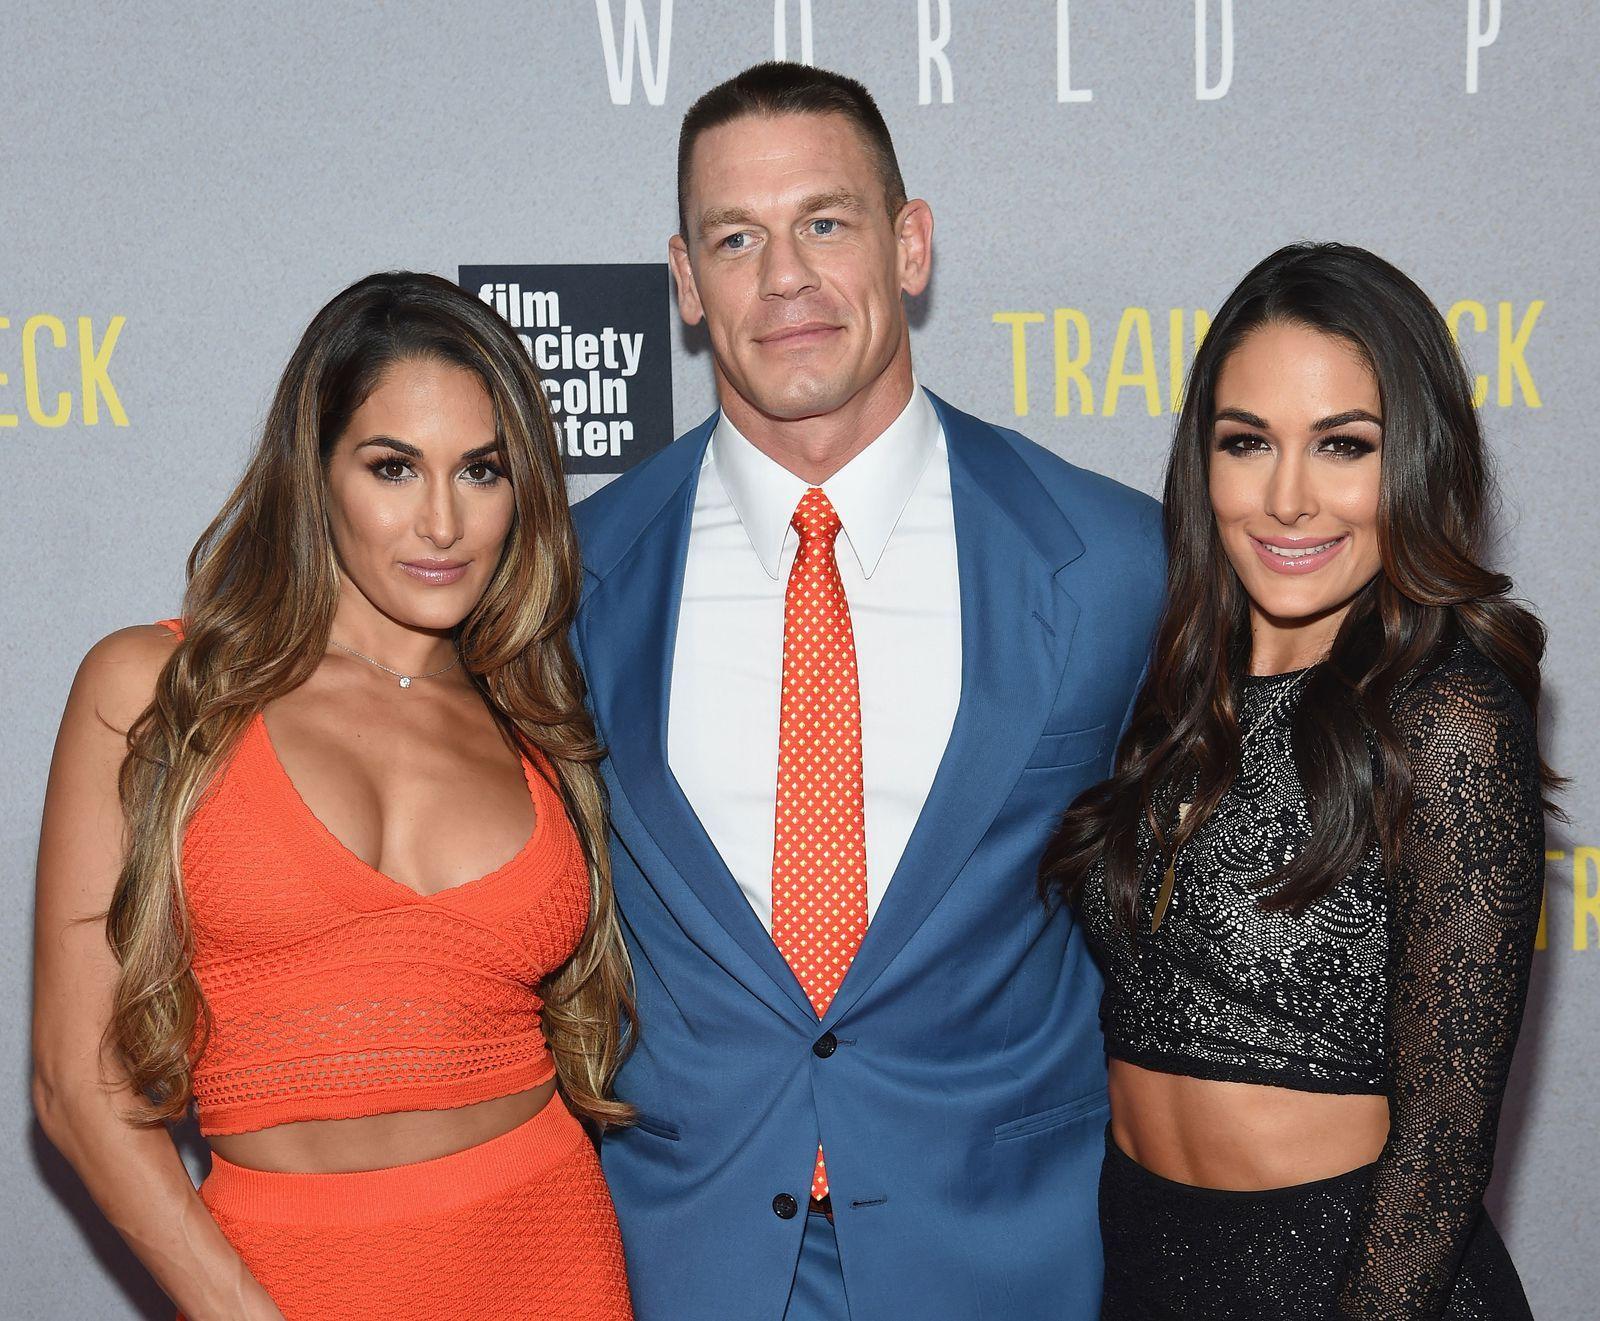 John Cena Said He S Willing To Have Surgery To Give Nikki Bella A Child John Cena And Nikki Bella Nikki And Brie Bella Nikki Bella